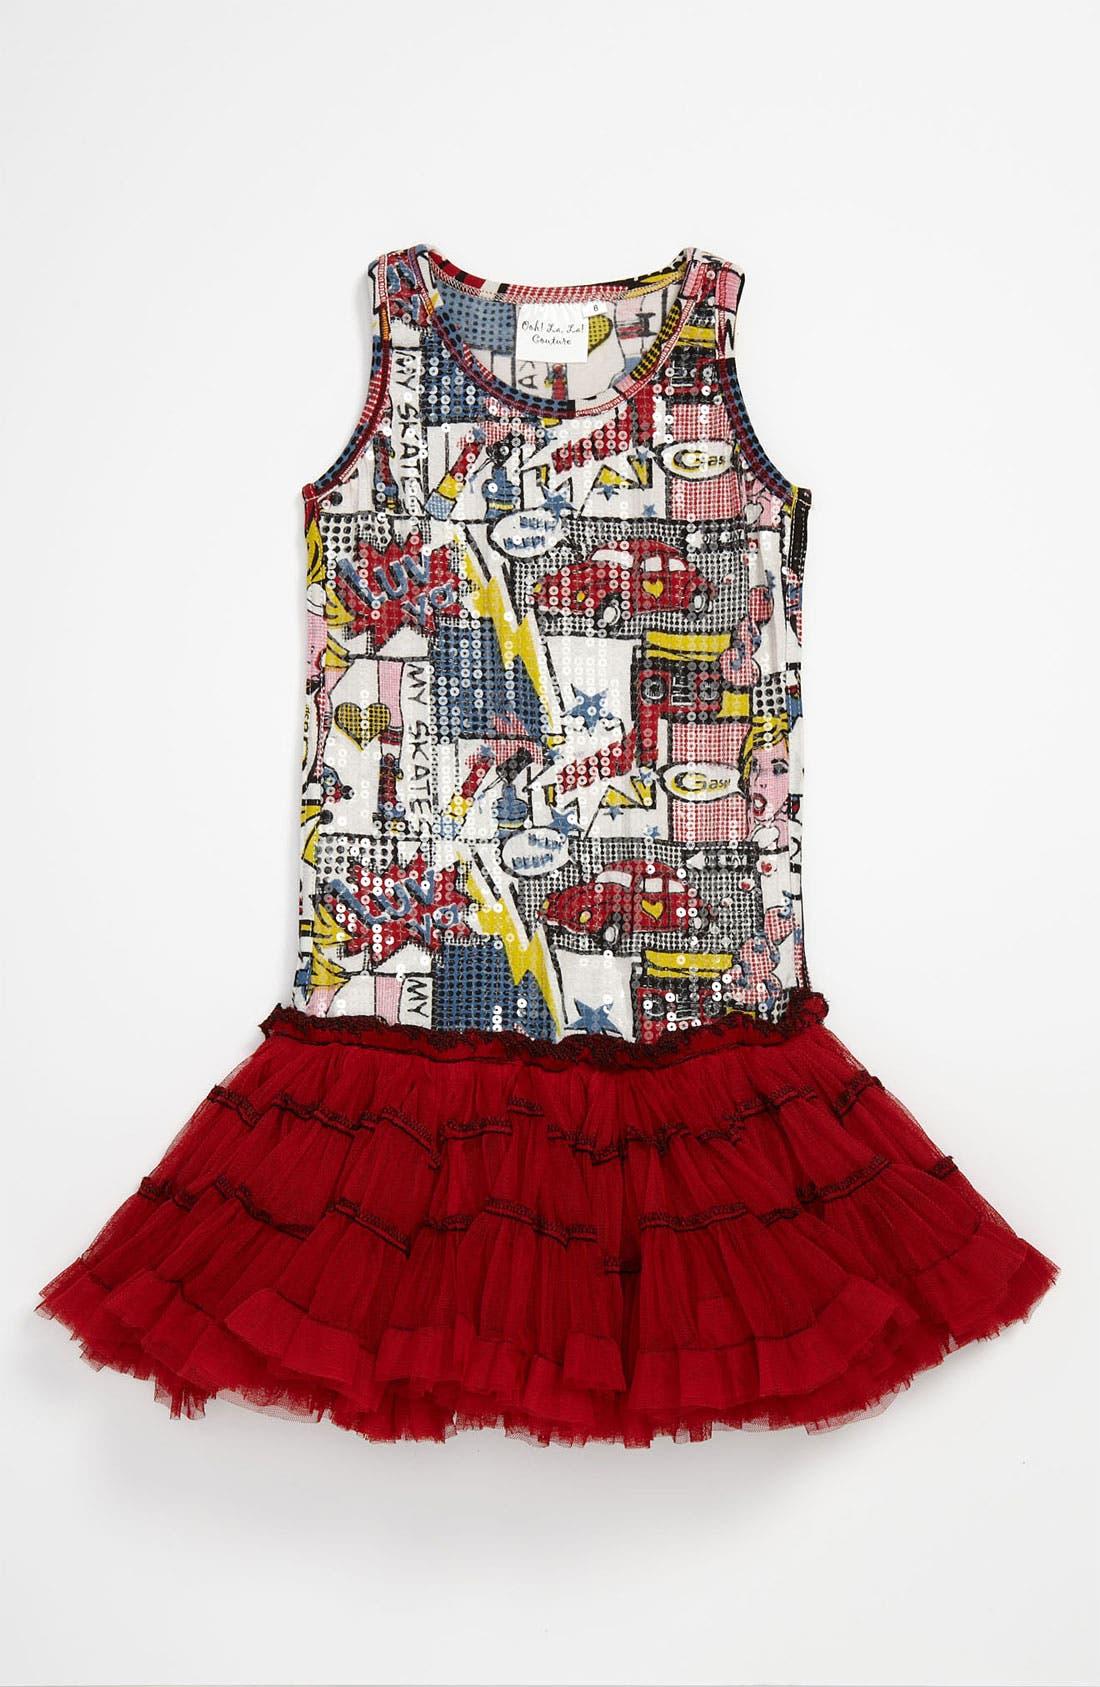 Alternate Image 1 Selected - Ooh! La, La! Couture Print Dress (Little Girls & Big Girls)